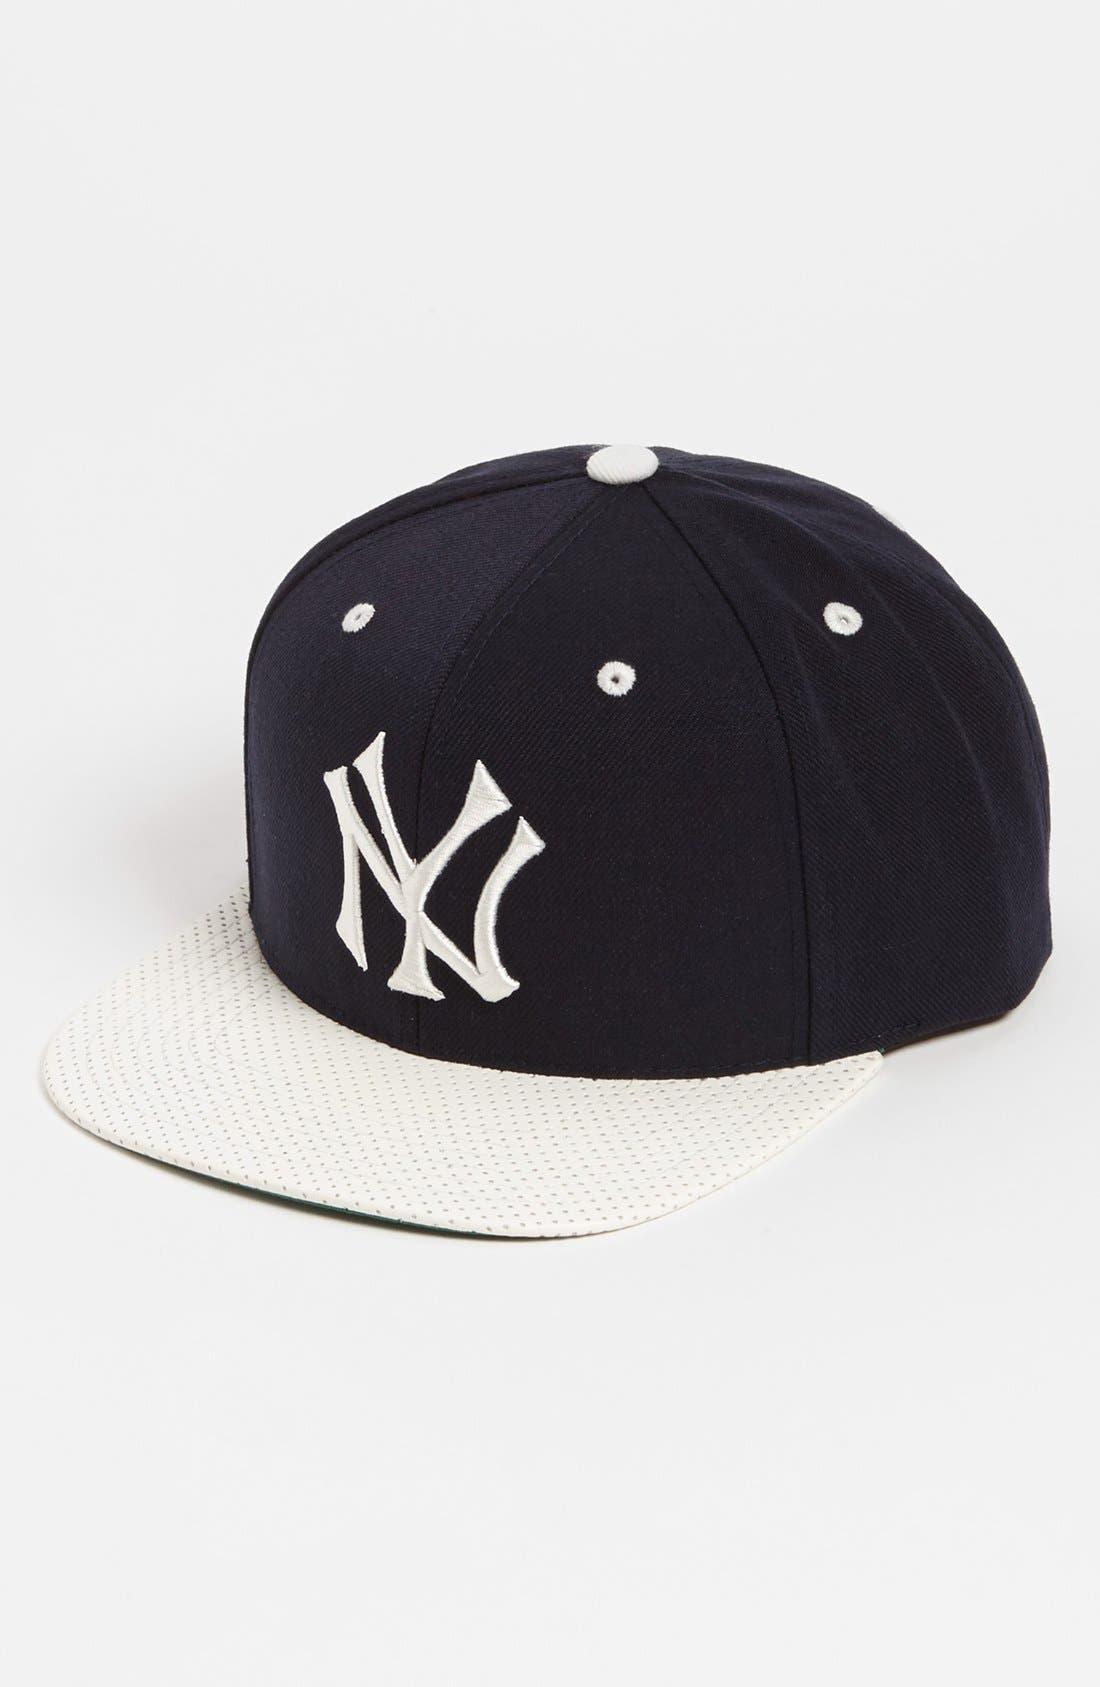 Alternate Image 1 Selected - American Needle 'New York Yankees - The Natural' Snapback Baseball Cap